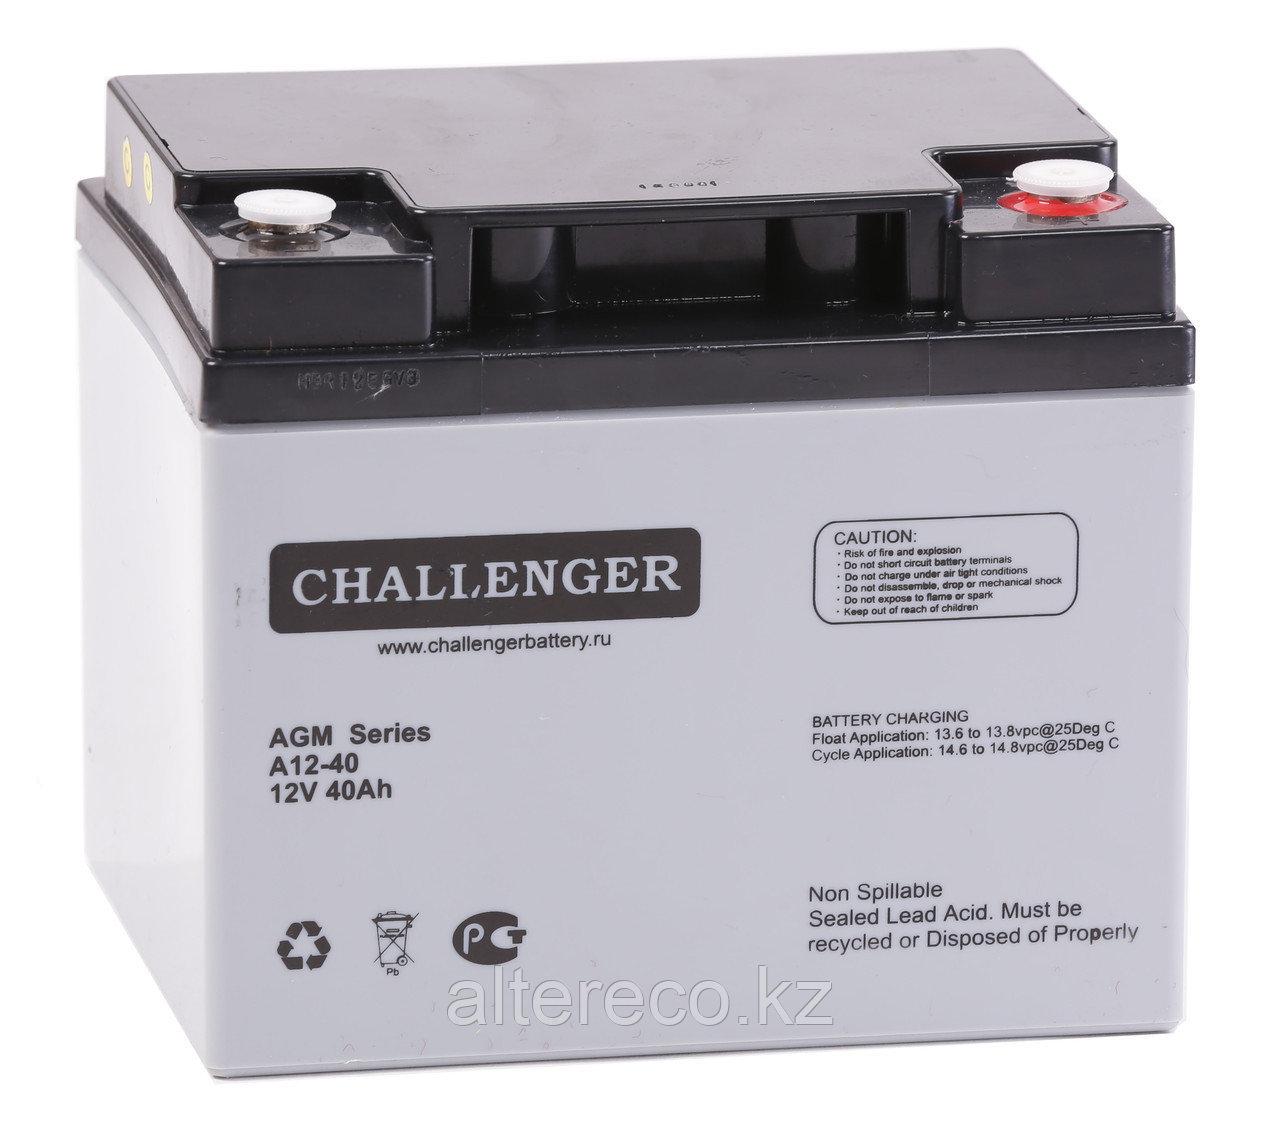 Аккумулятор Challenger A12-45 (12В, 45Ач)